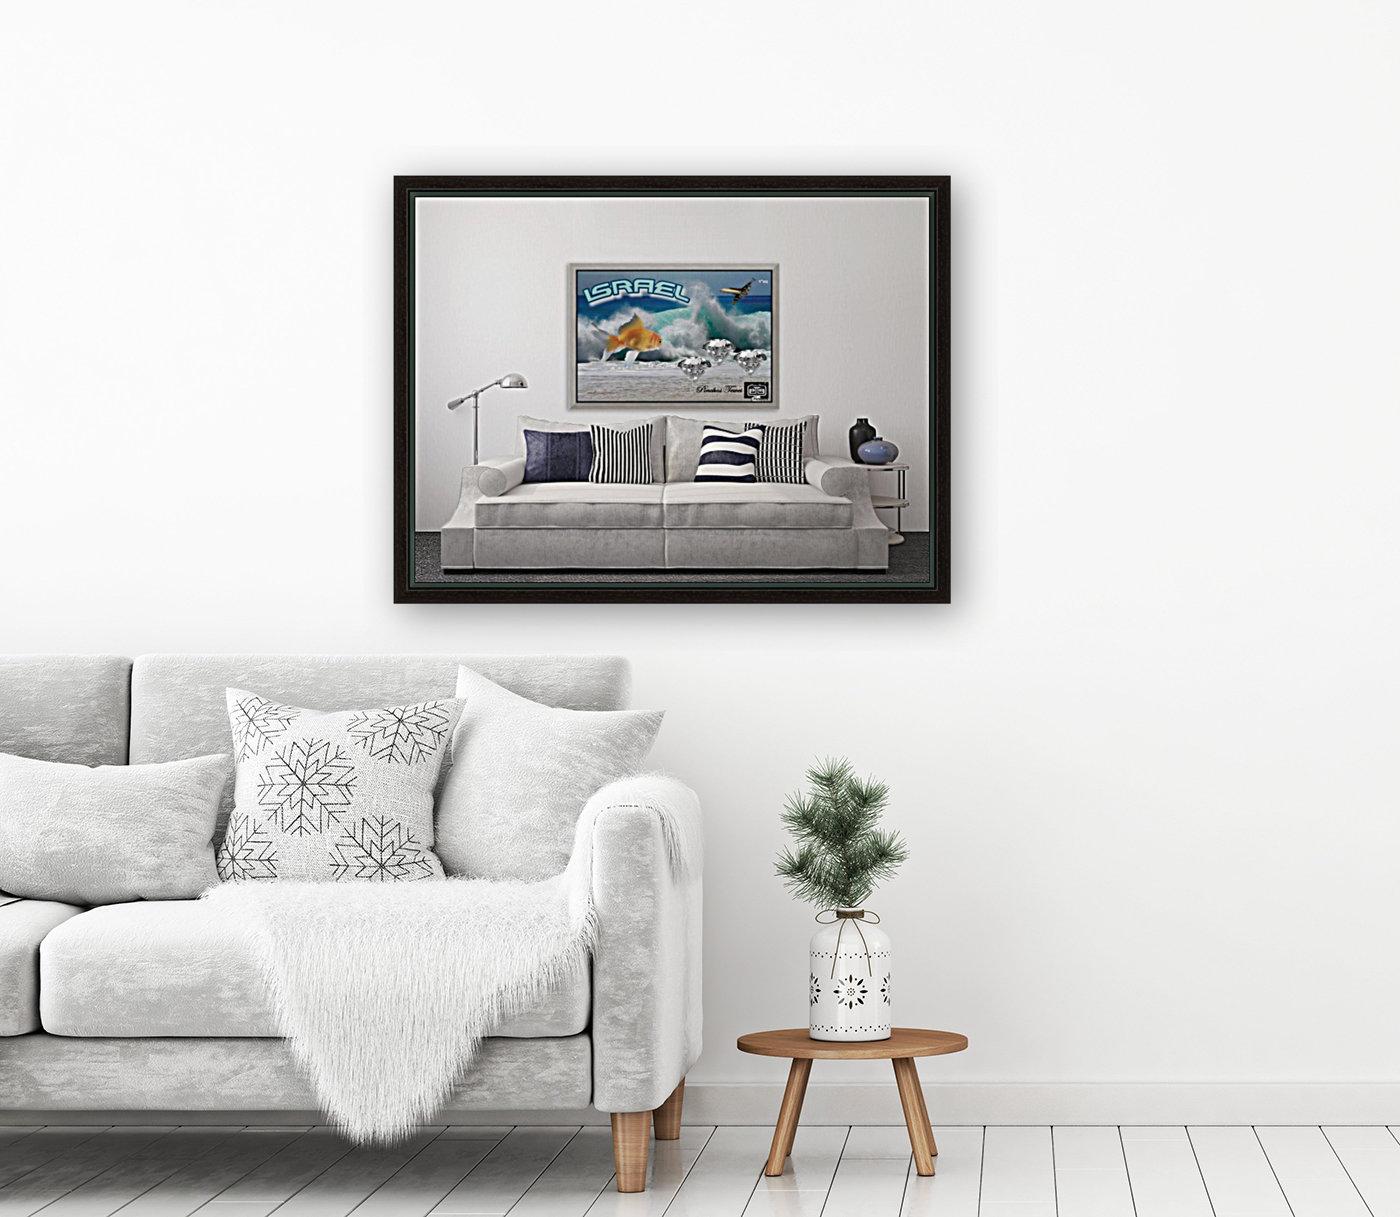 monogram art   israel ocean 1 FOR DSPLAY ONLY in room setting  Art